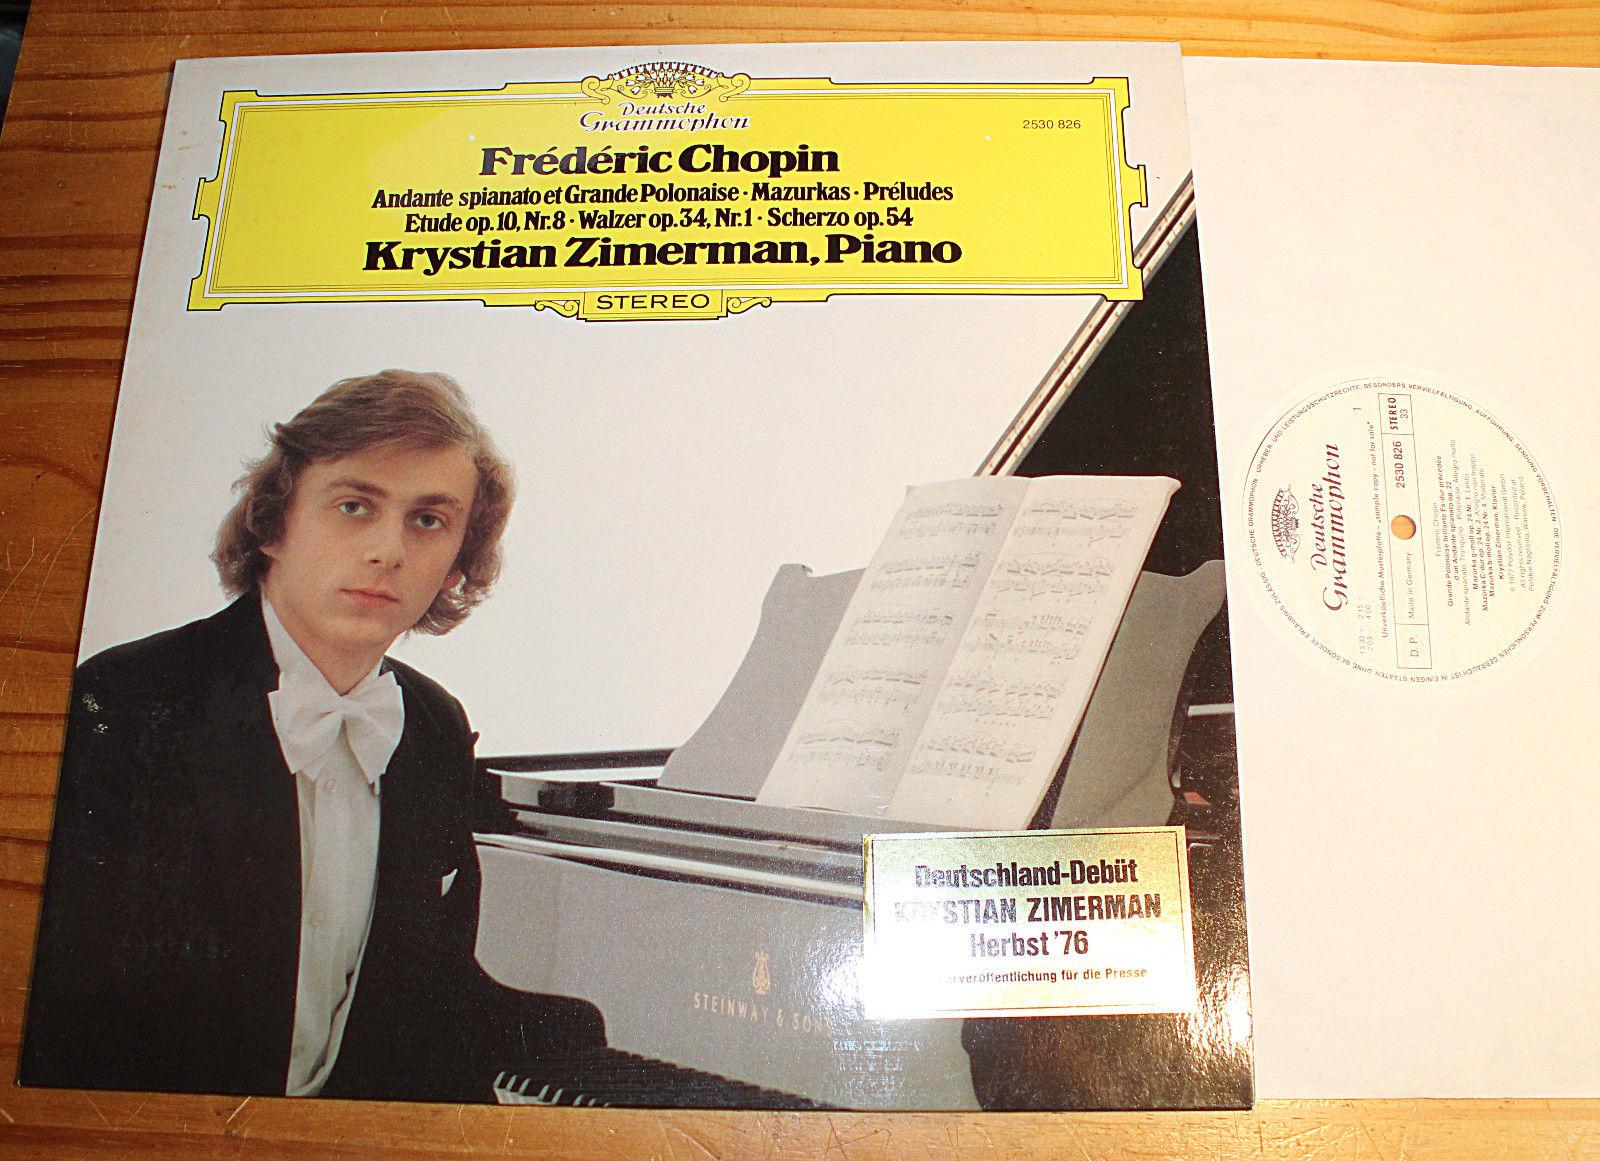 PROMO WHITE LABEL: Krystian ZIMERMAN Chopin Recital LP DG